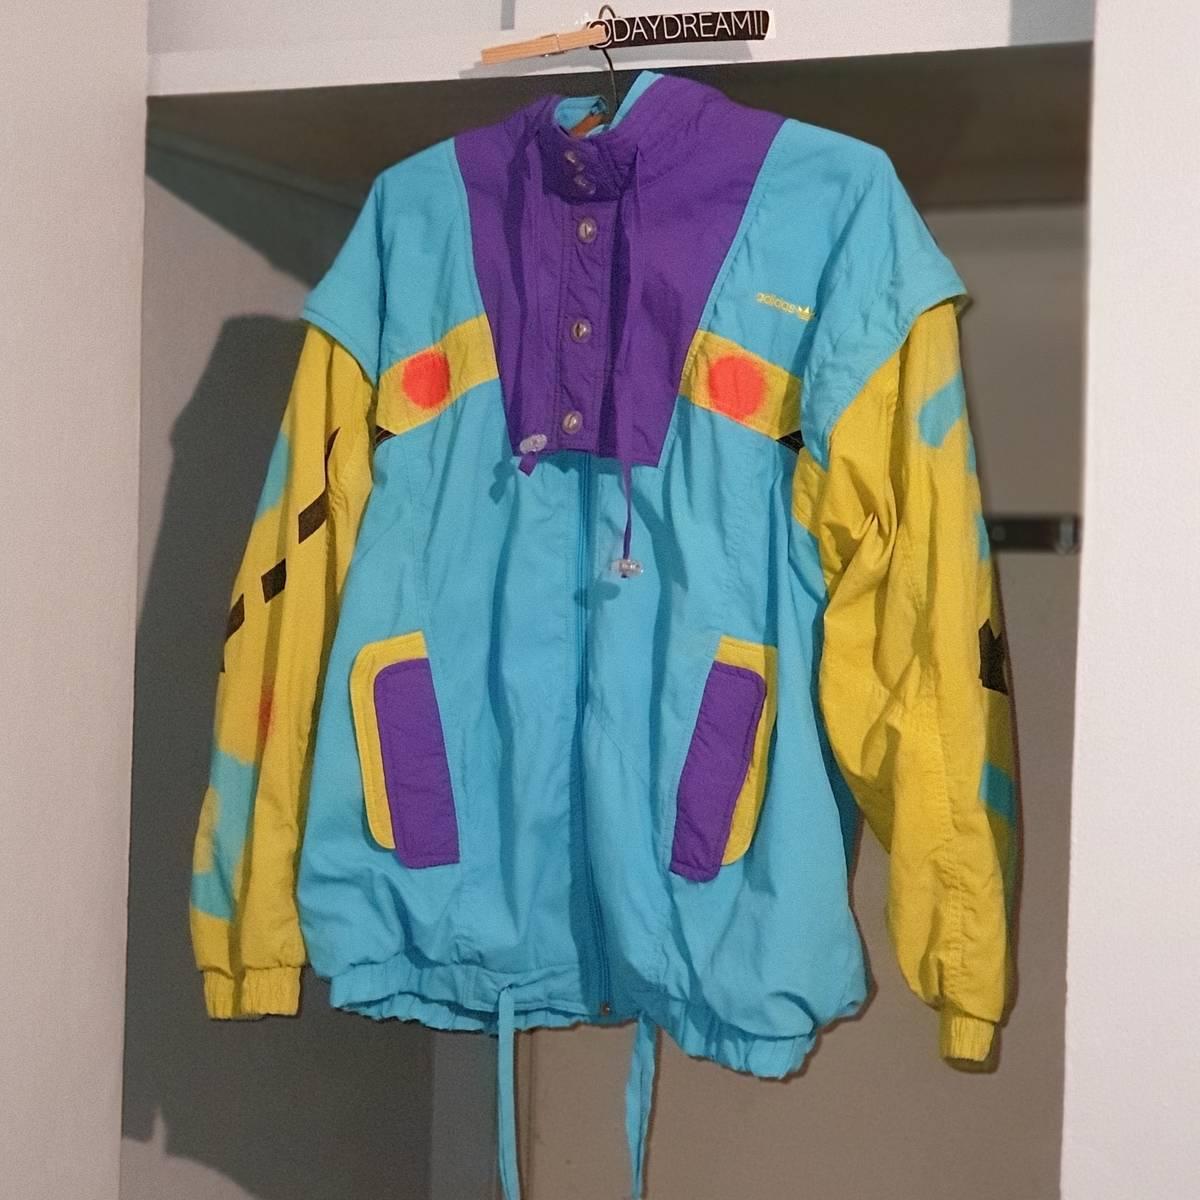 Adidas Adidas Vintage Colorful Colorblock Windbreaker Nylon Jacket Size S $90